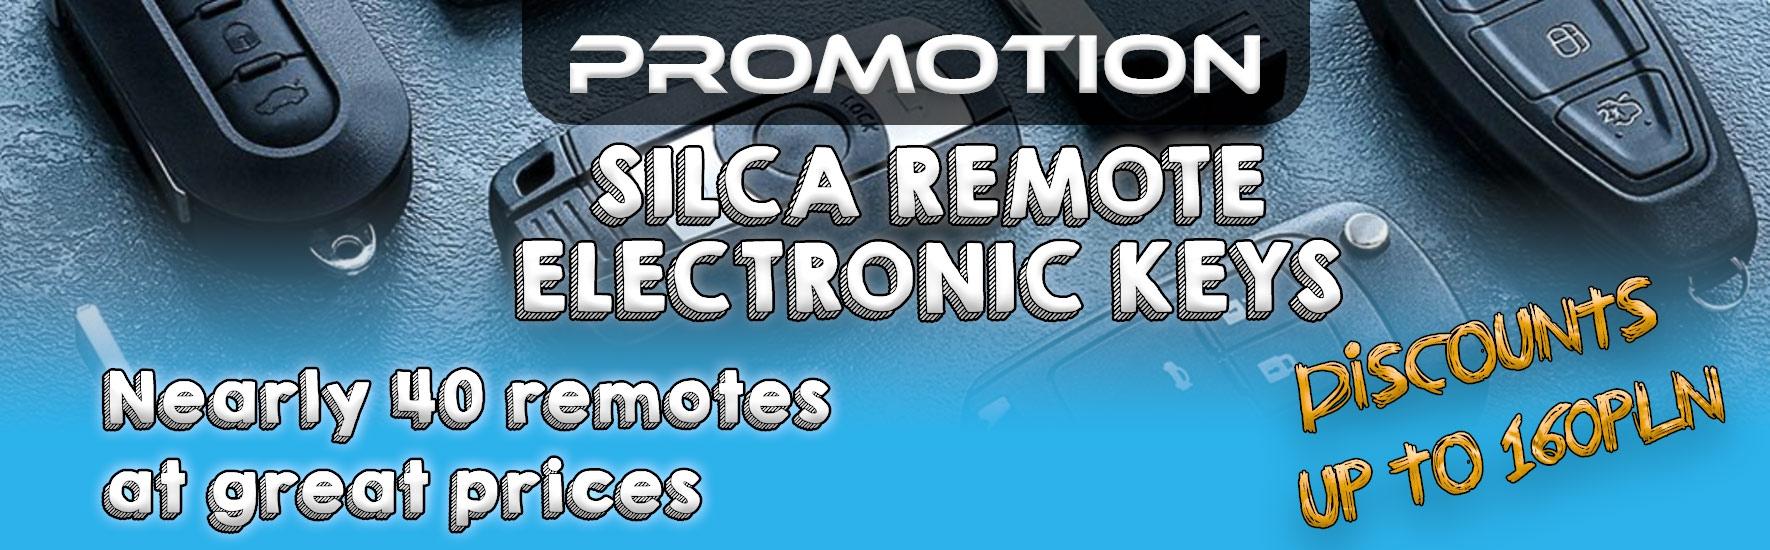 Silca remotes